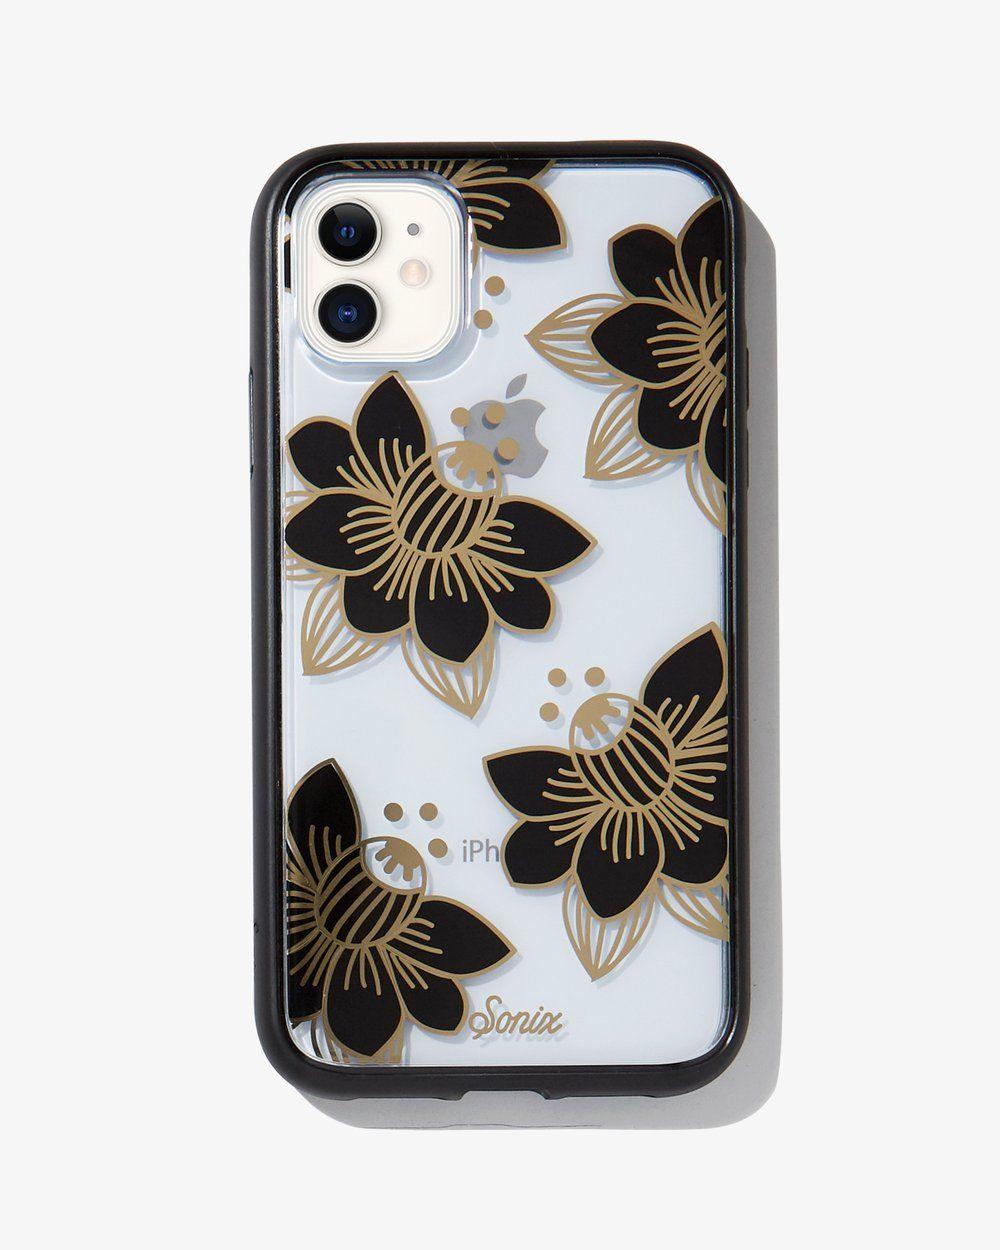 Iphone Xr Black Aesthetic Case